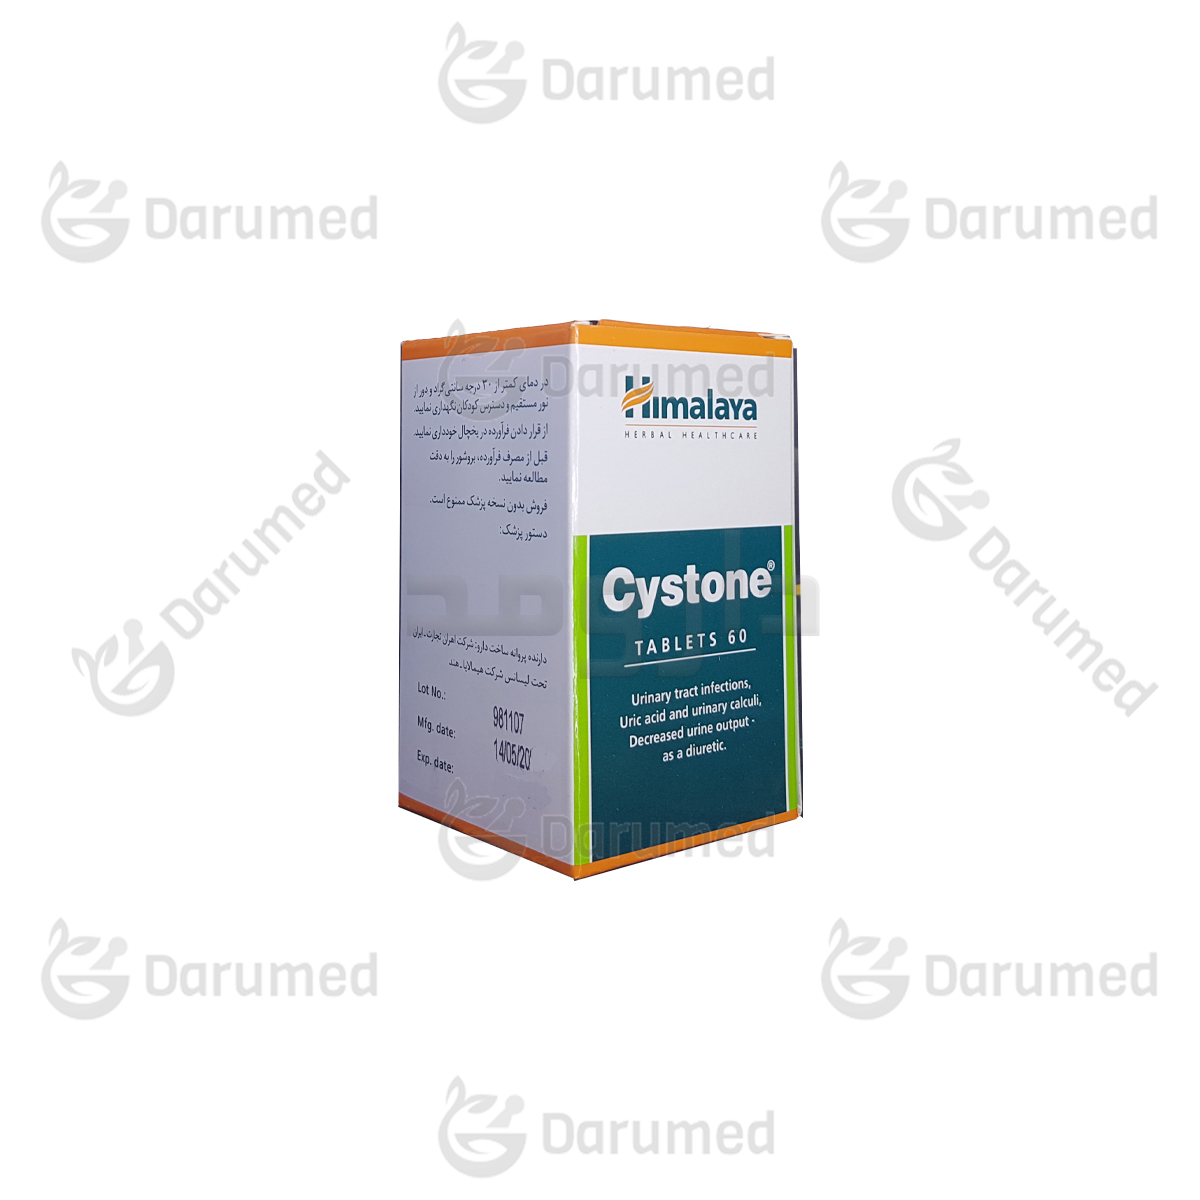 cystone-himalaya-60-tabs